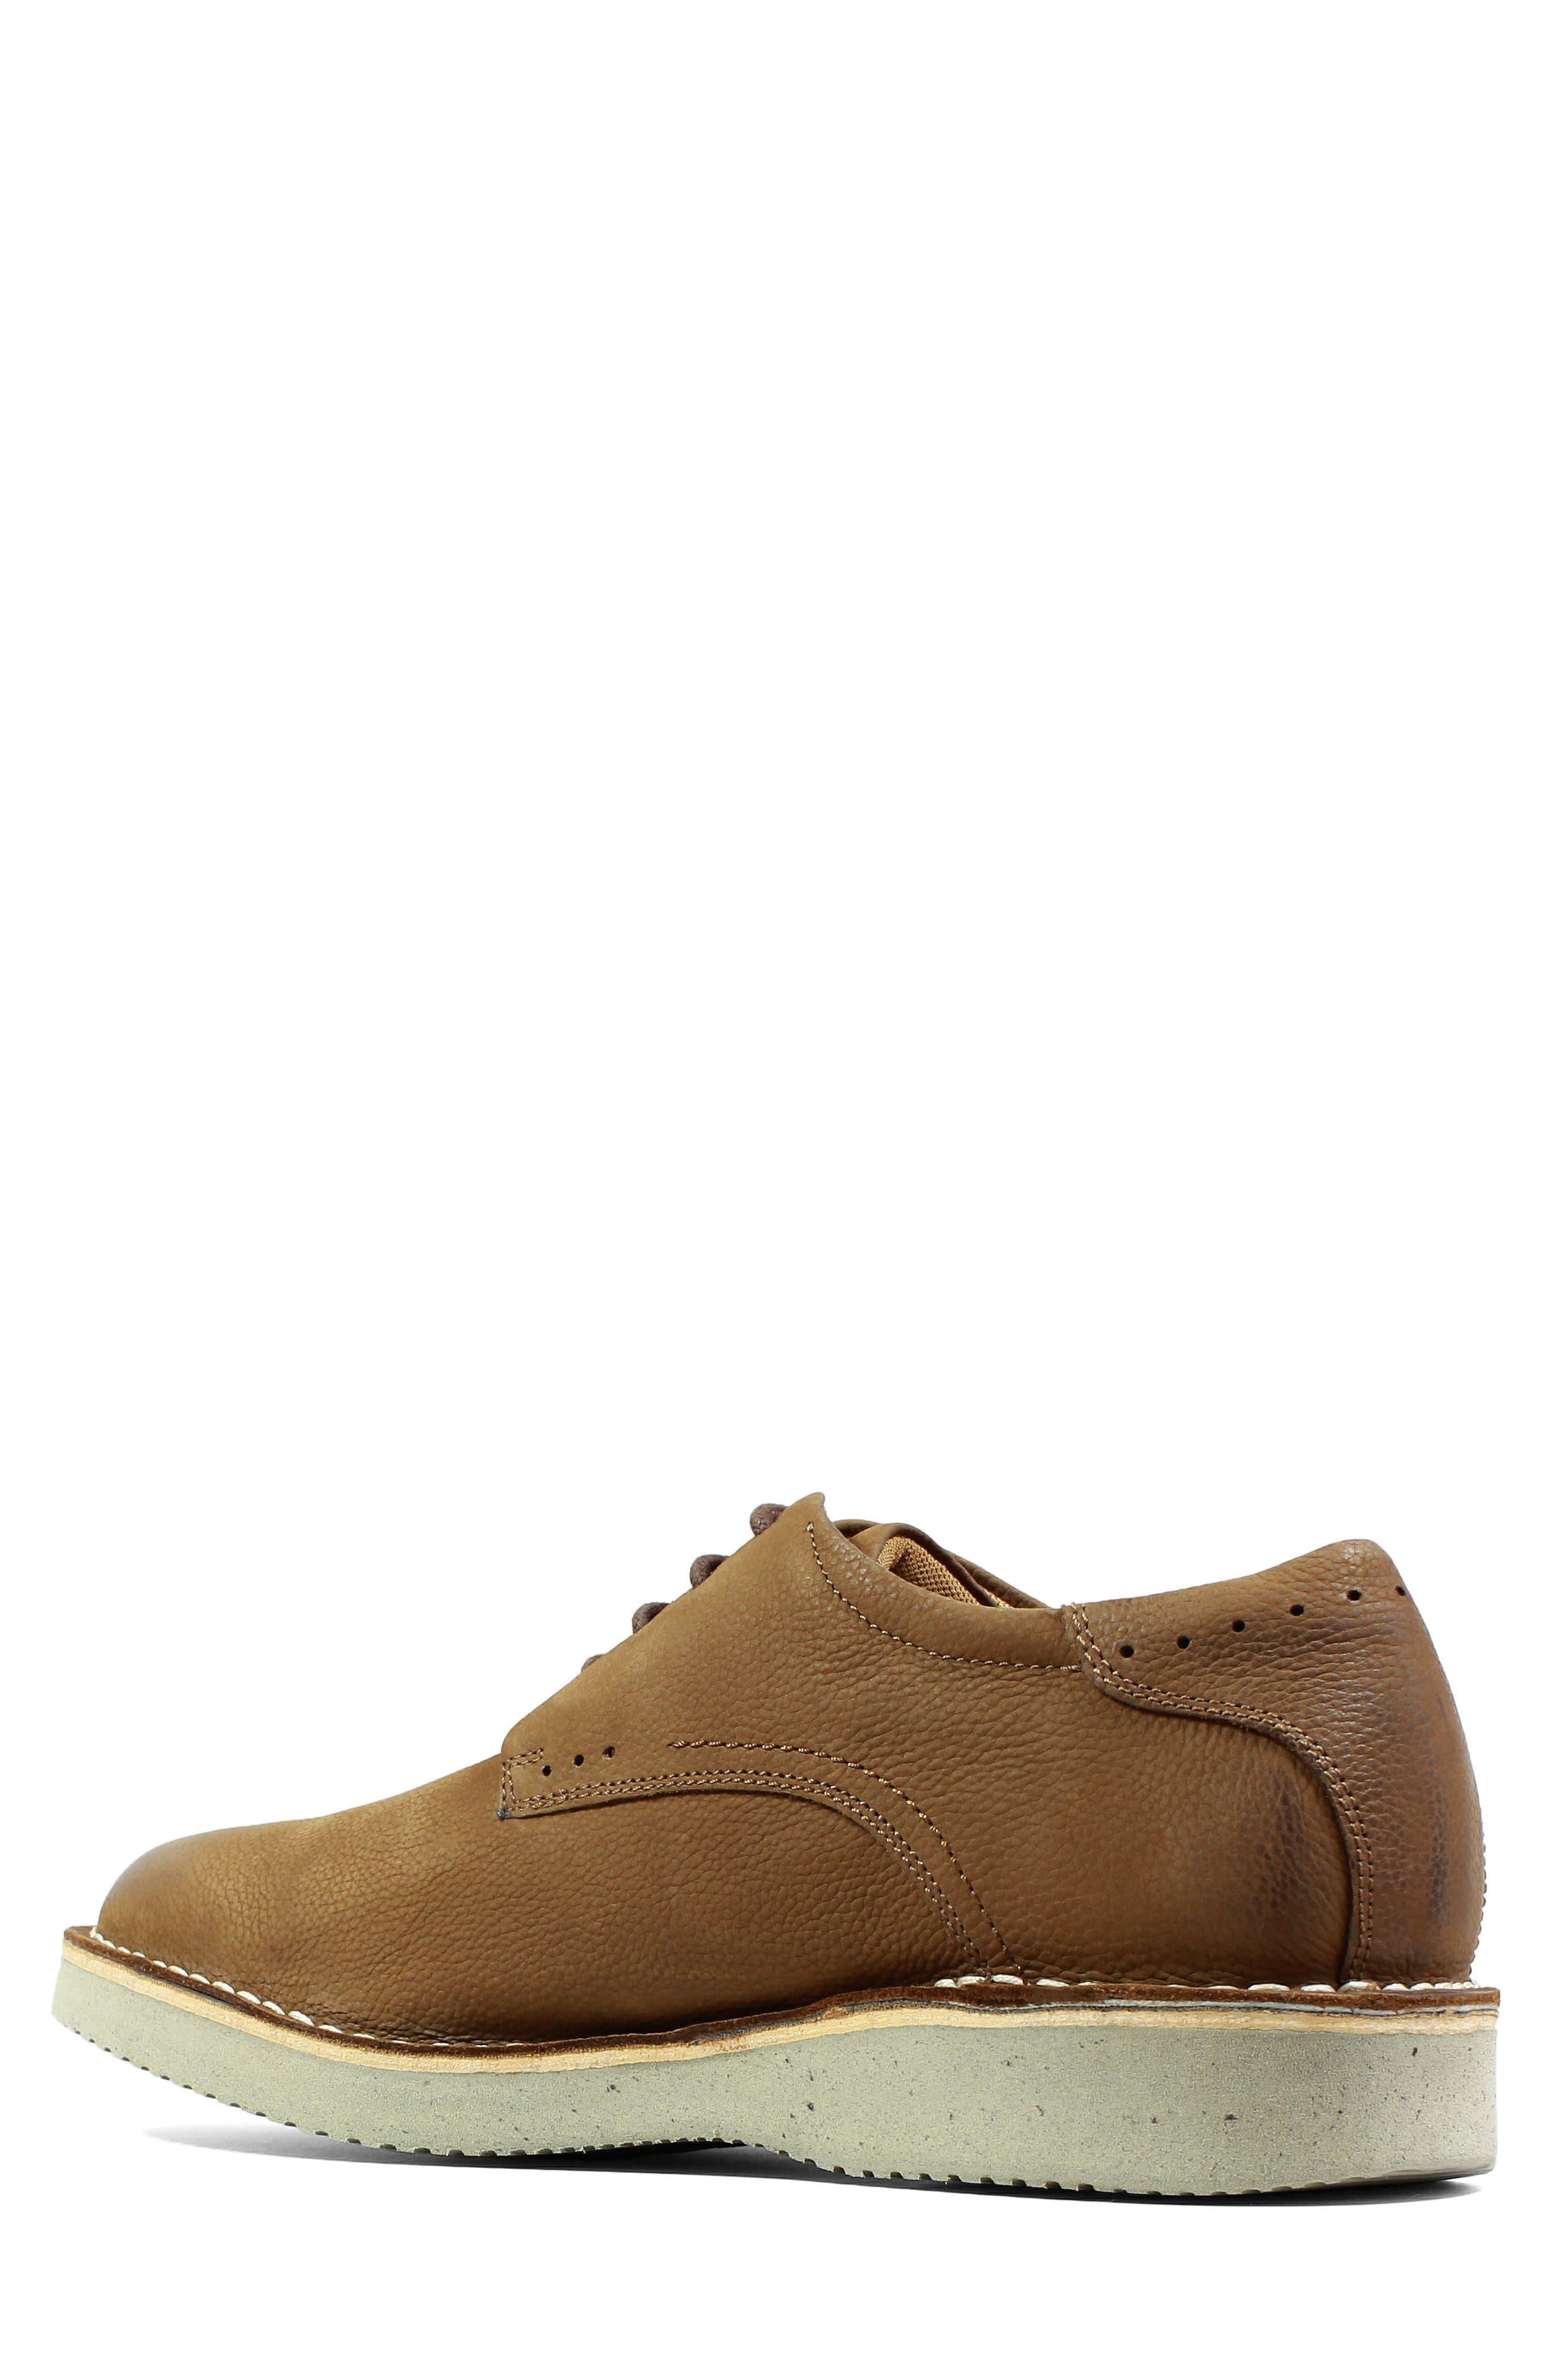 Navigator Plain Toe Oxford,                             Alternate thumbnail 2, color,                             Cocoa Nubuck Leather